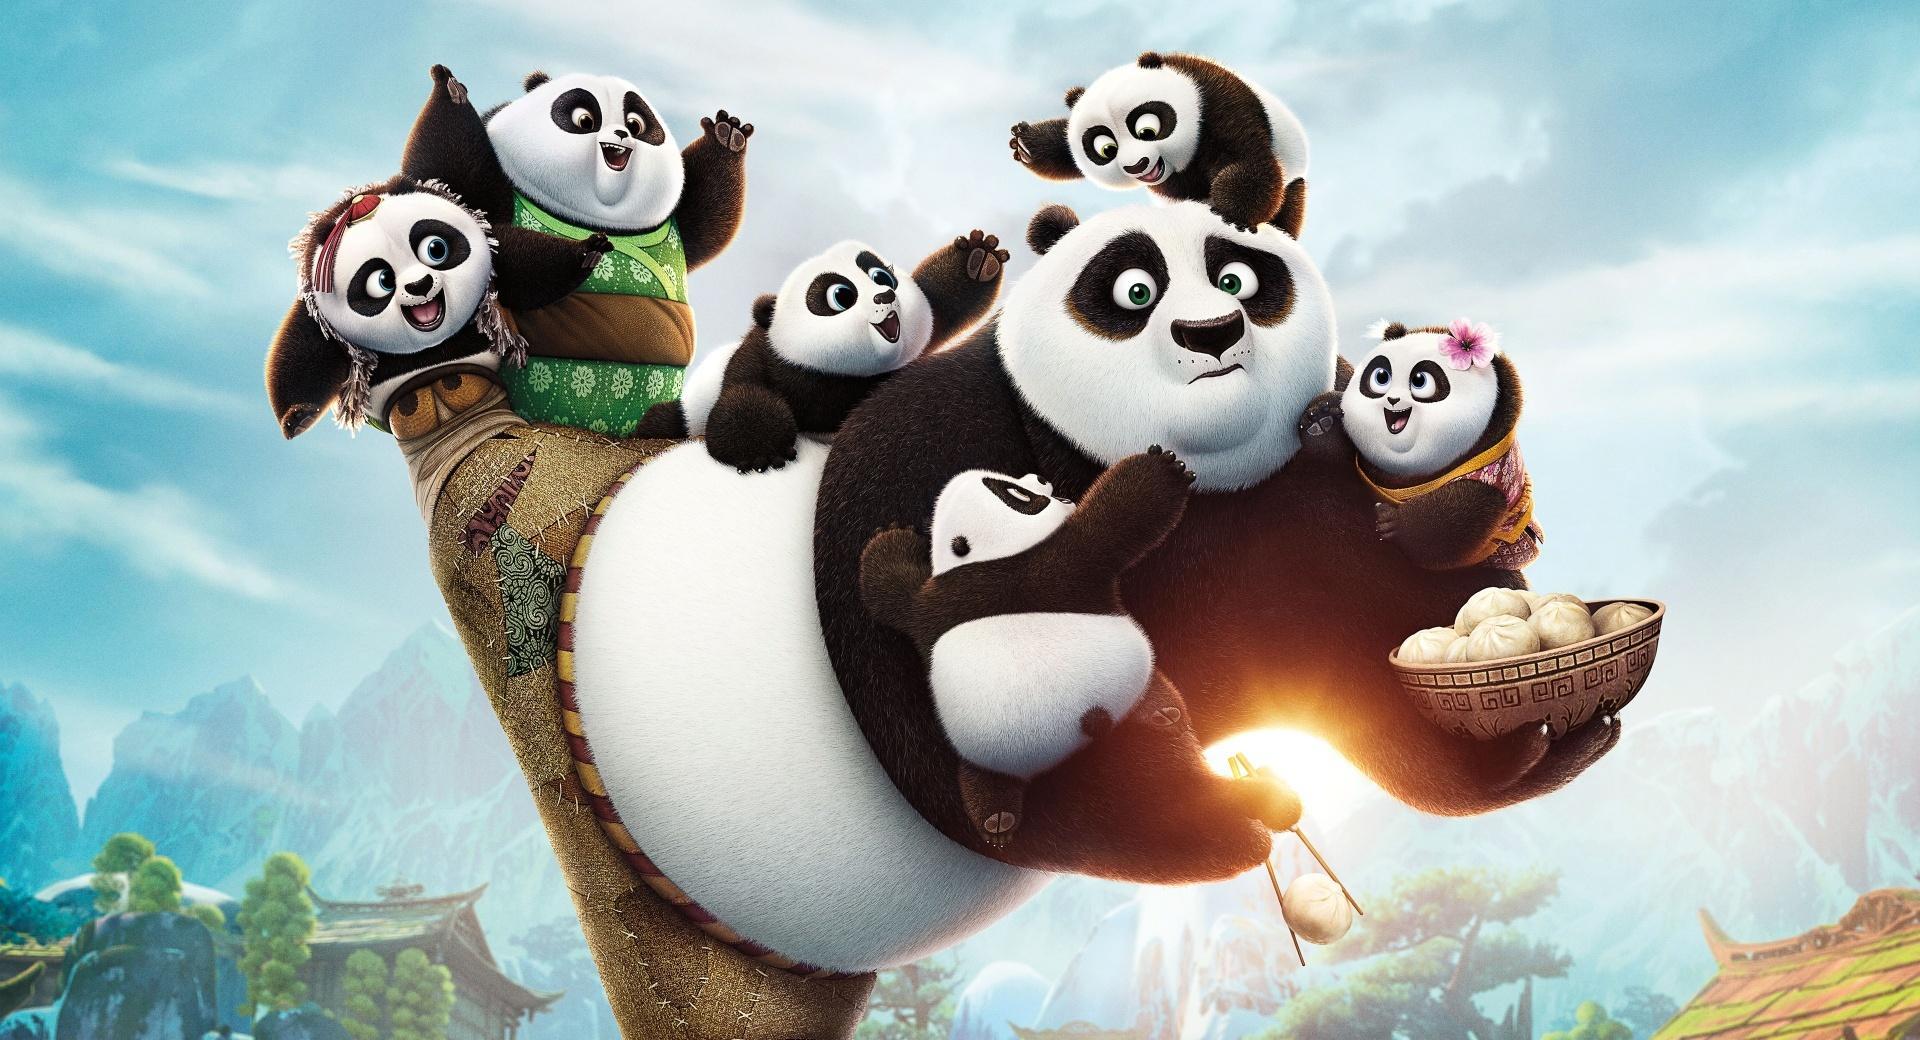 Kung Fu Panda 3 2016 wallpapers HD quality